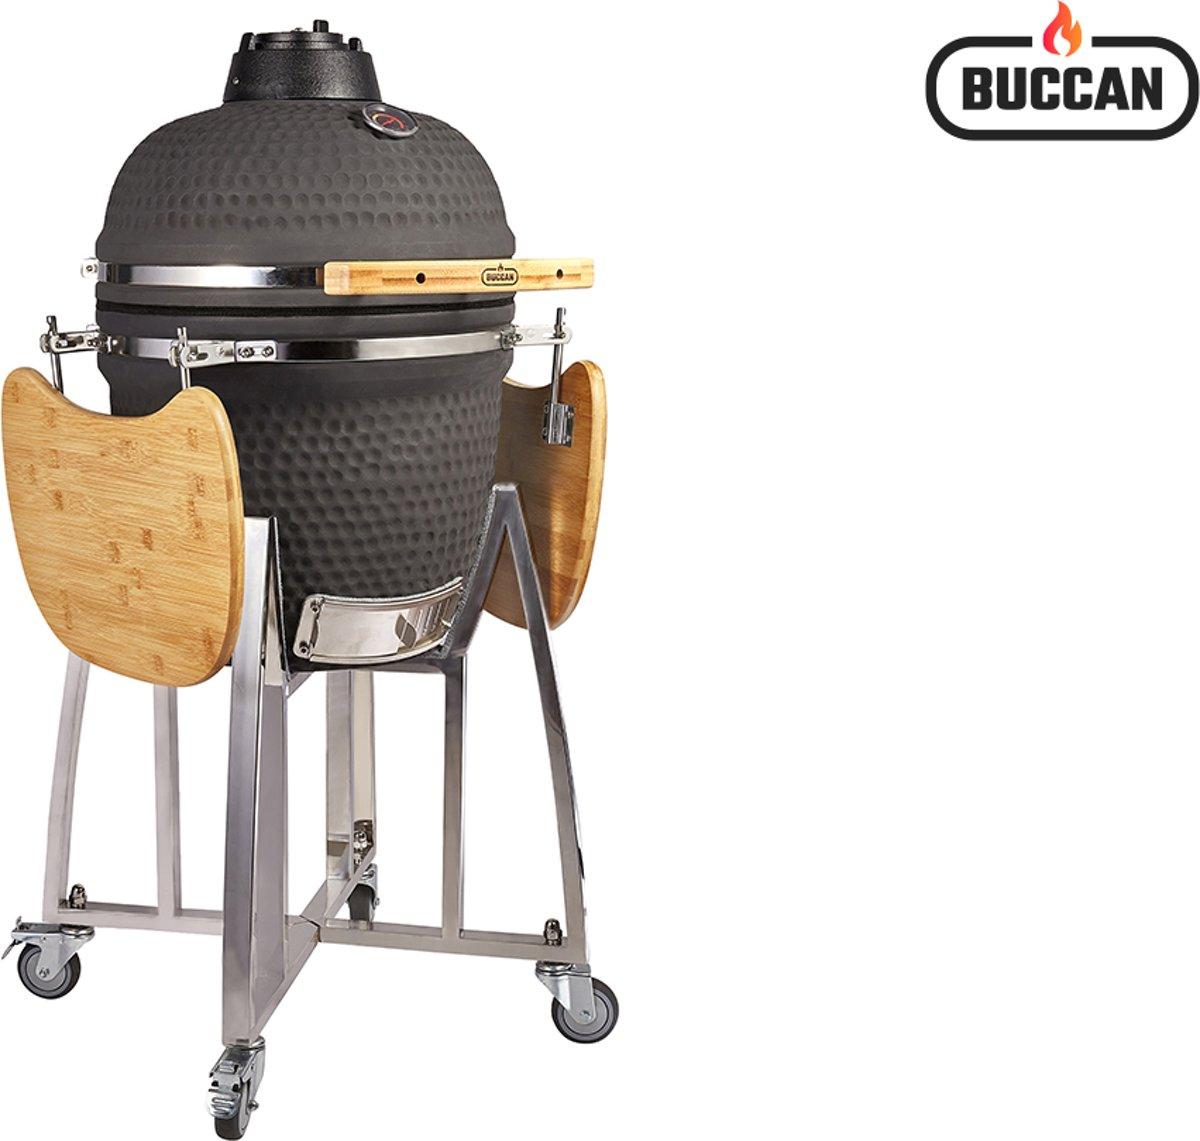 Buccan BBQ - Sunbury Smokey Egg - Large - Zwart kopen